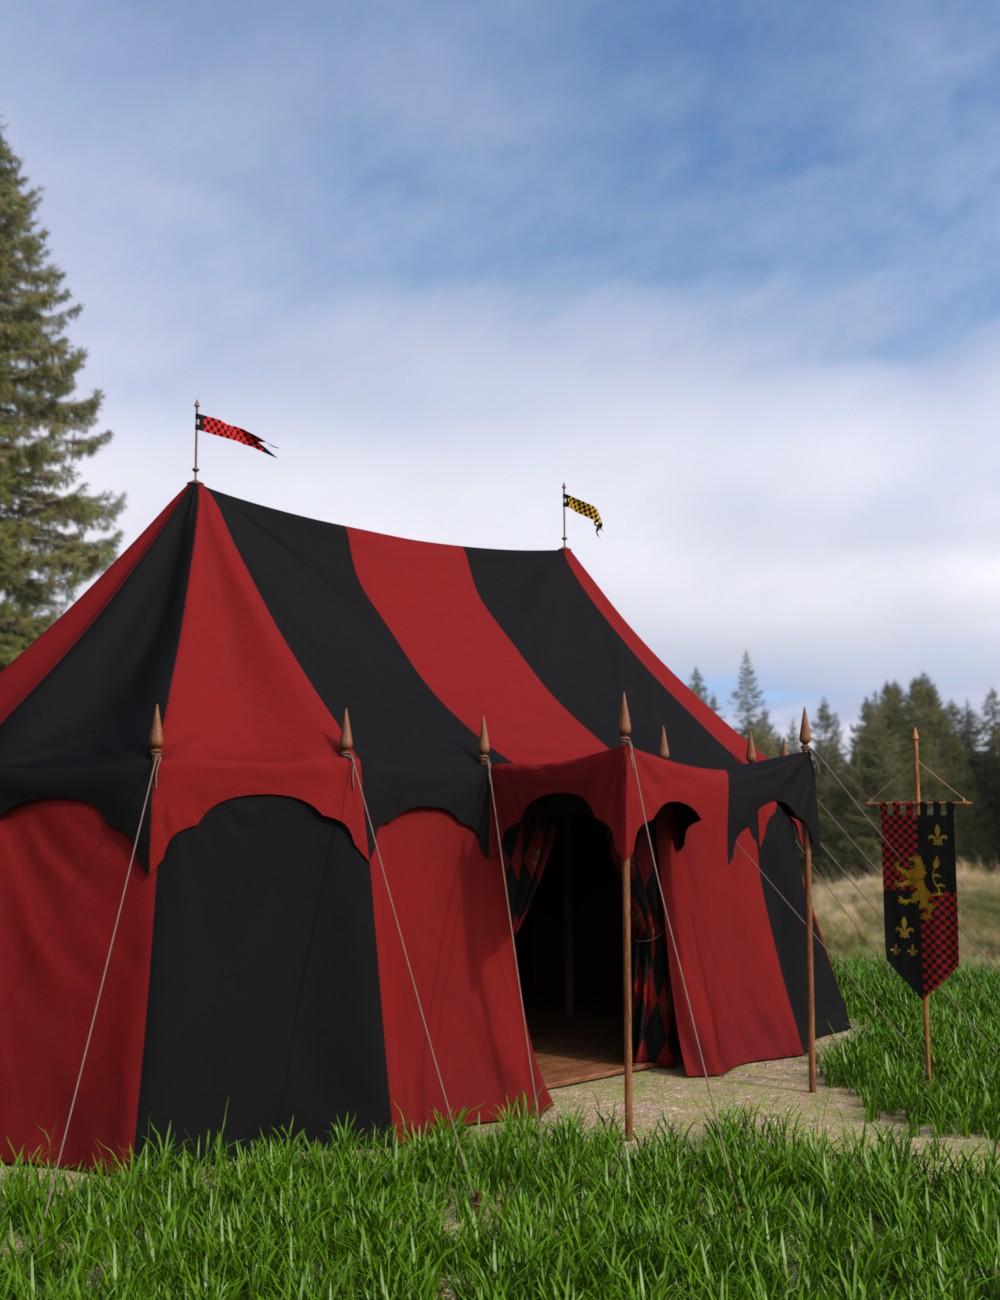 Commander's Tent Textures by: Goriav, 3D Models by Daz 3D